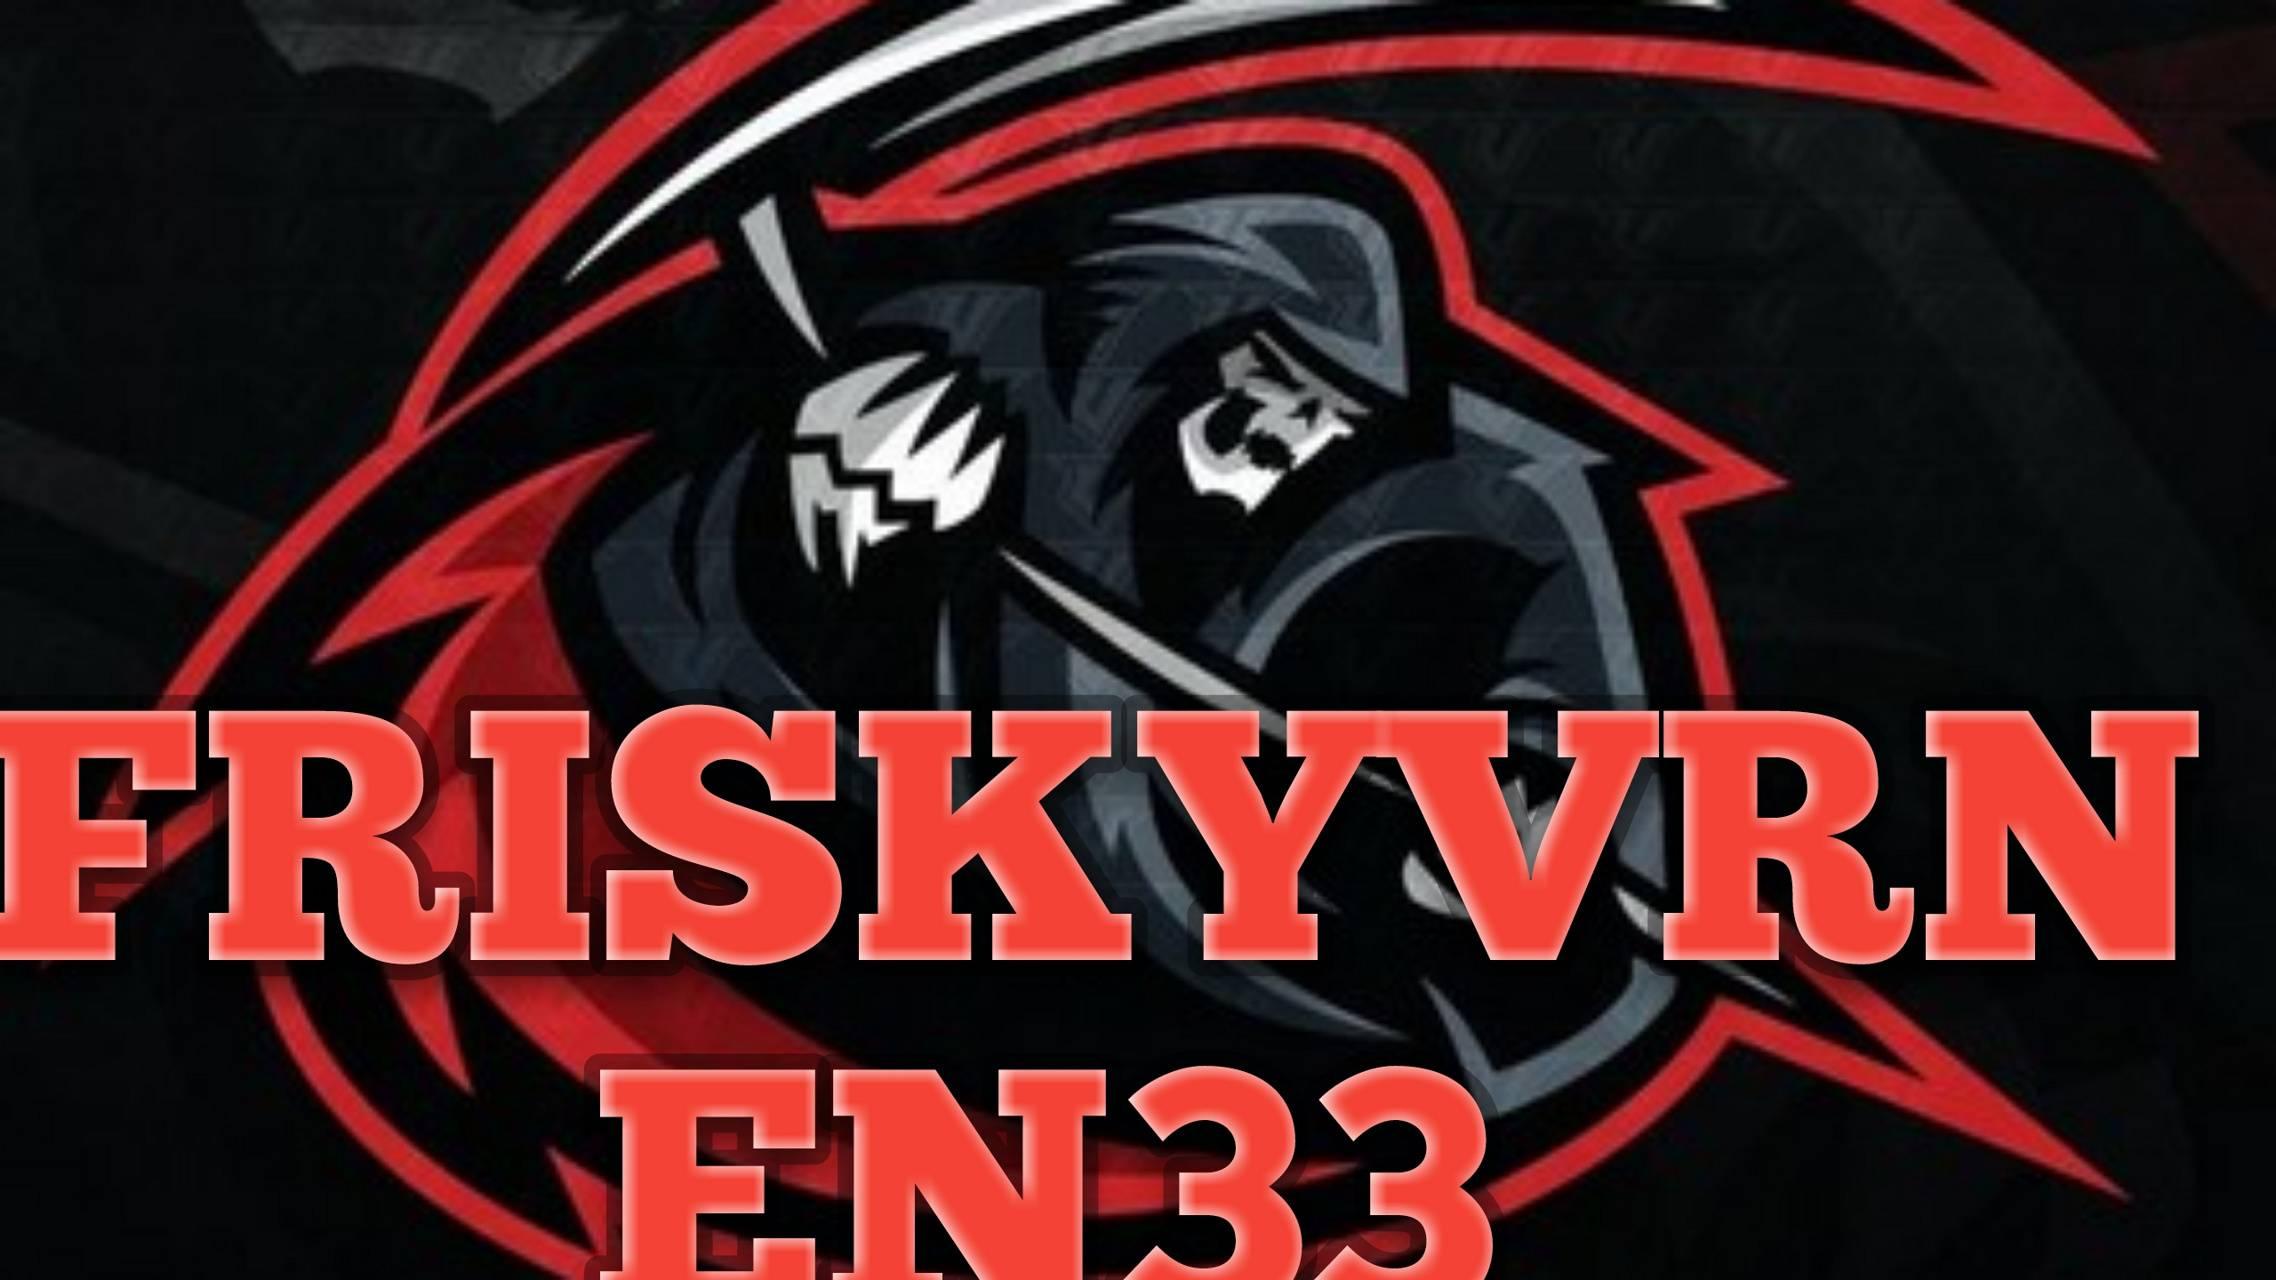 Friskyvrnen33